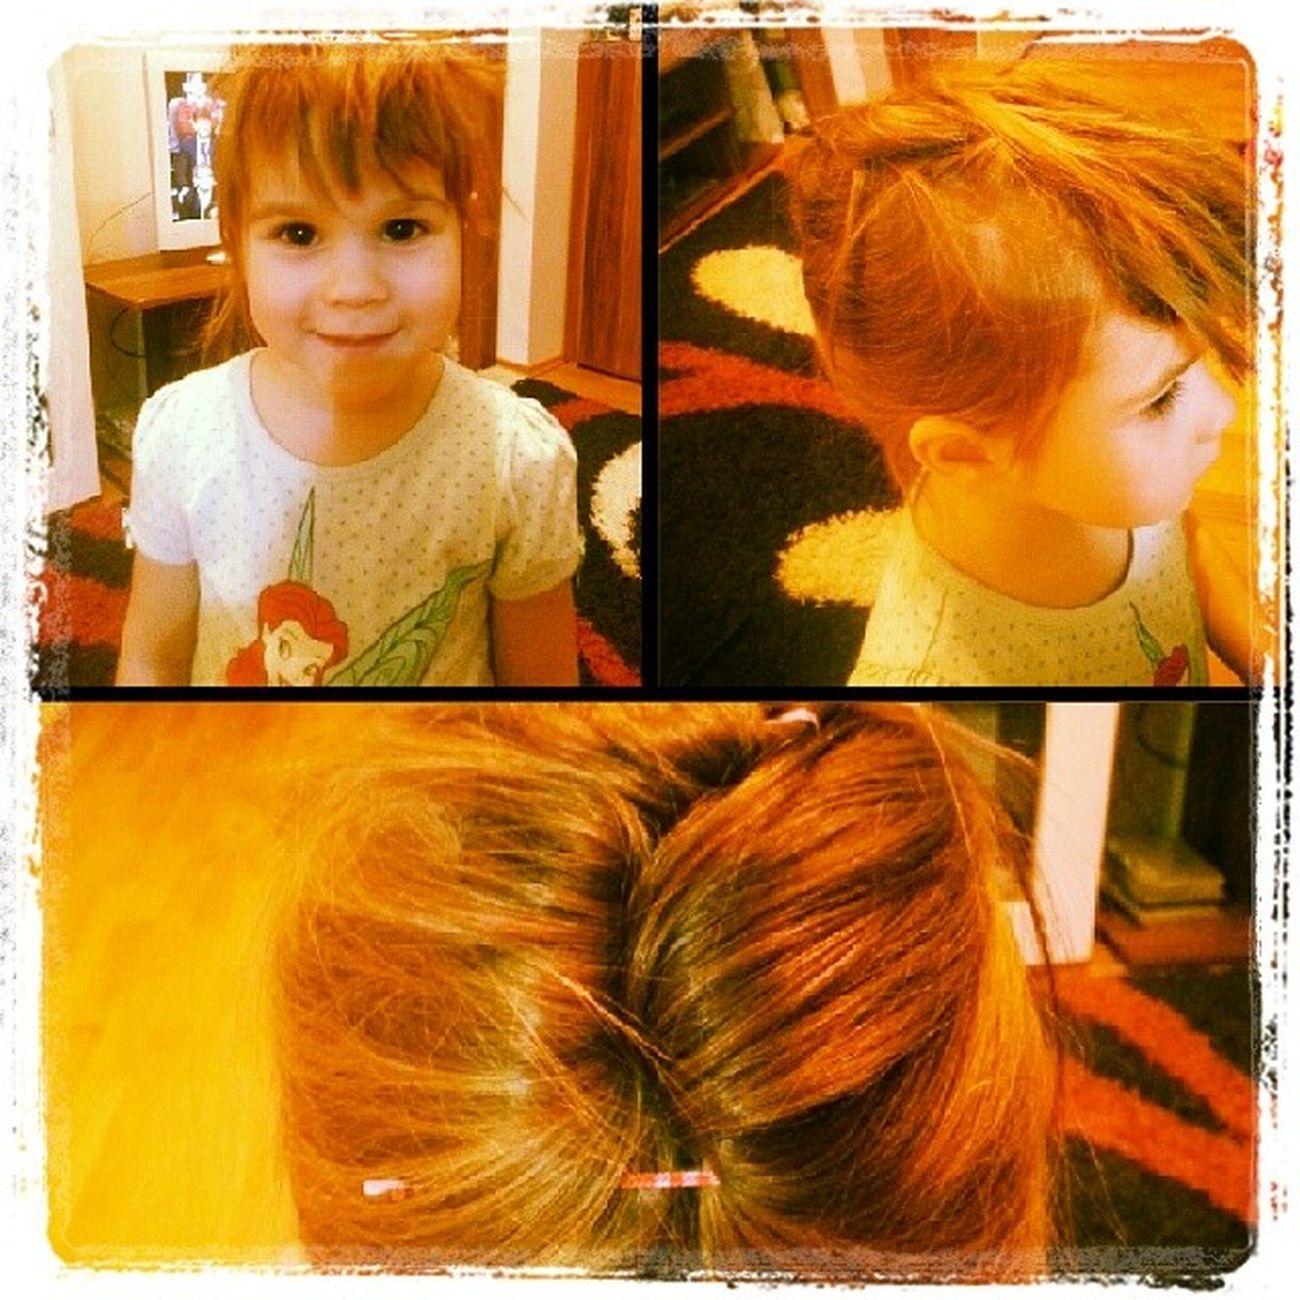 Mummyishavingfun Ladygaga Littleladygaga MarryTheNight prettygirl babygirl hairstyle hair style hairfashion